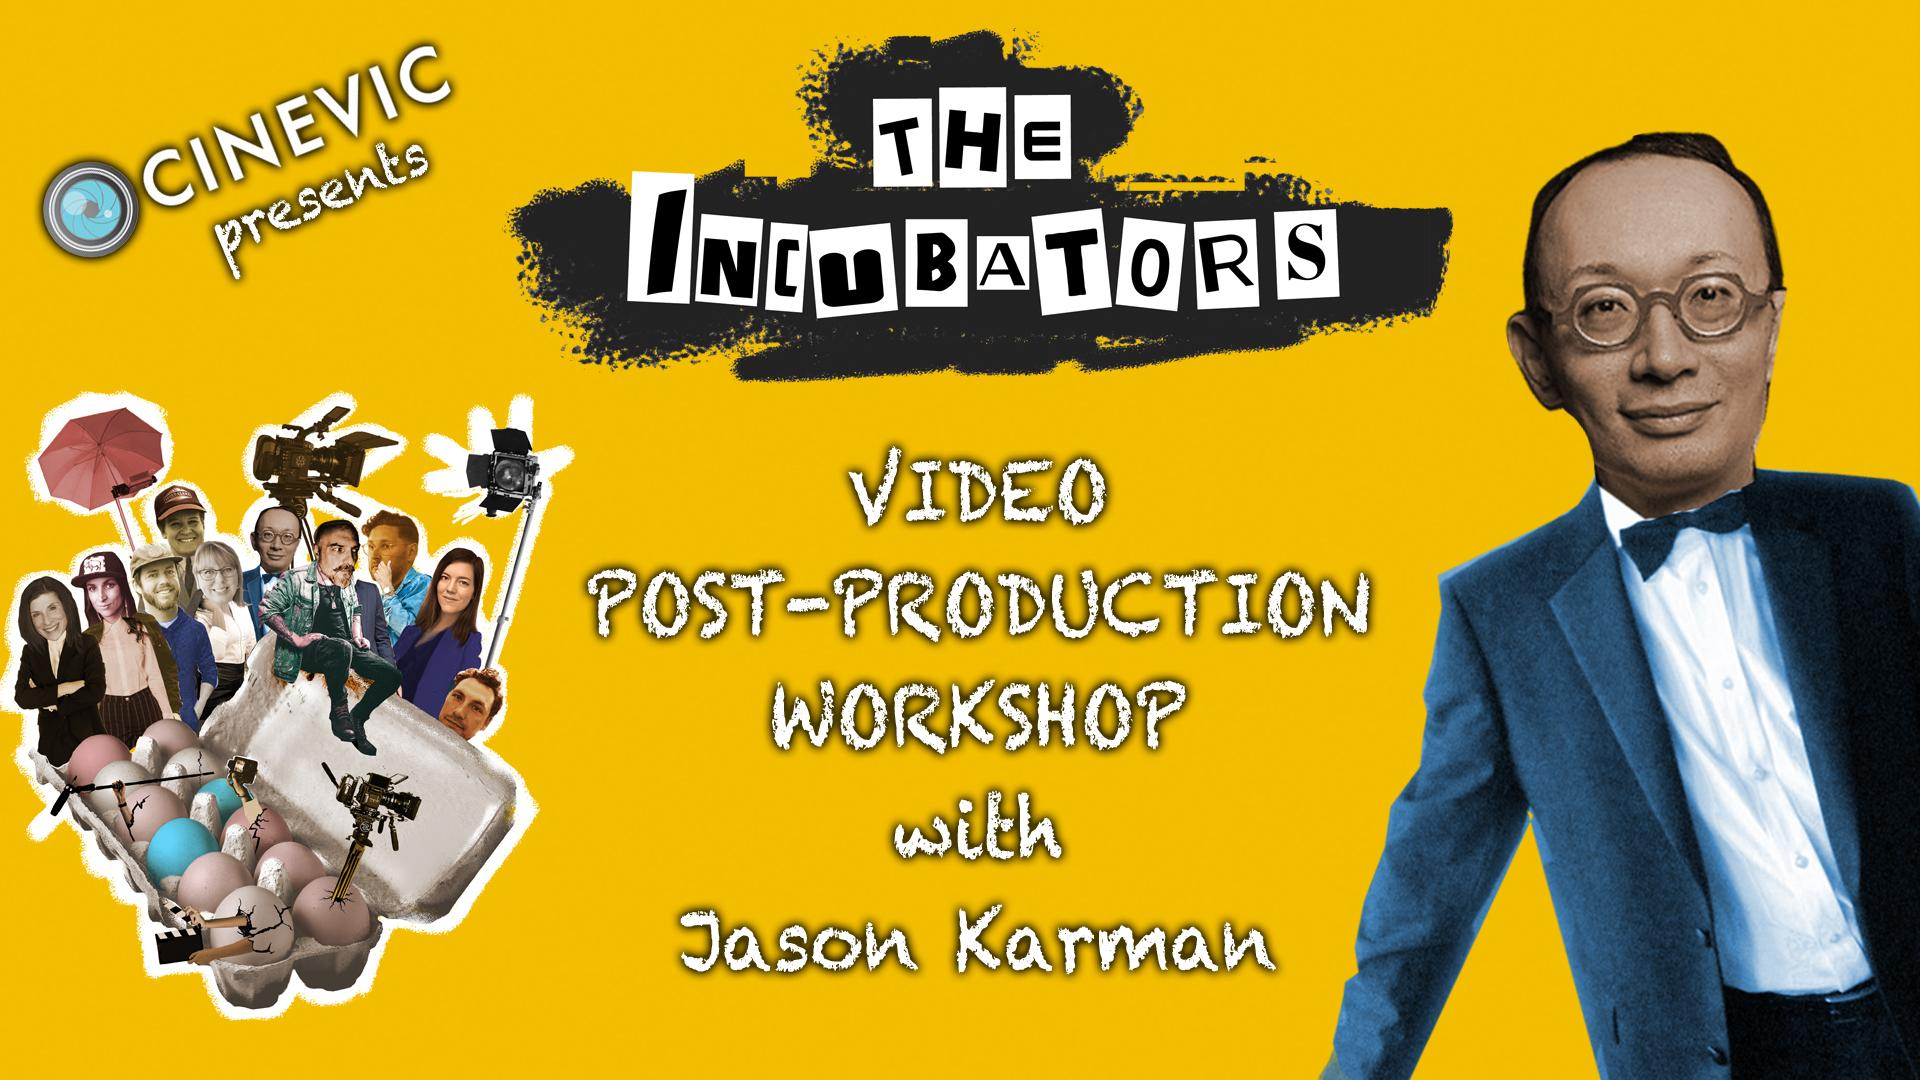 Video Post-Production Workshop with Jason Karman